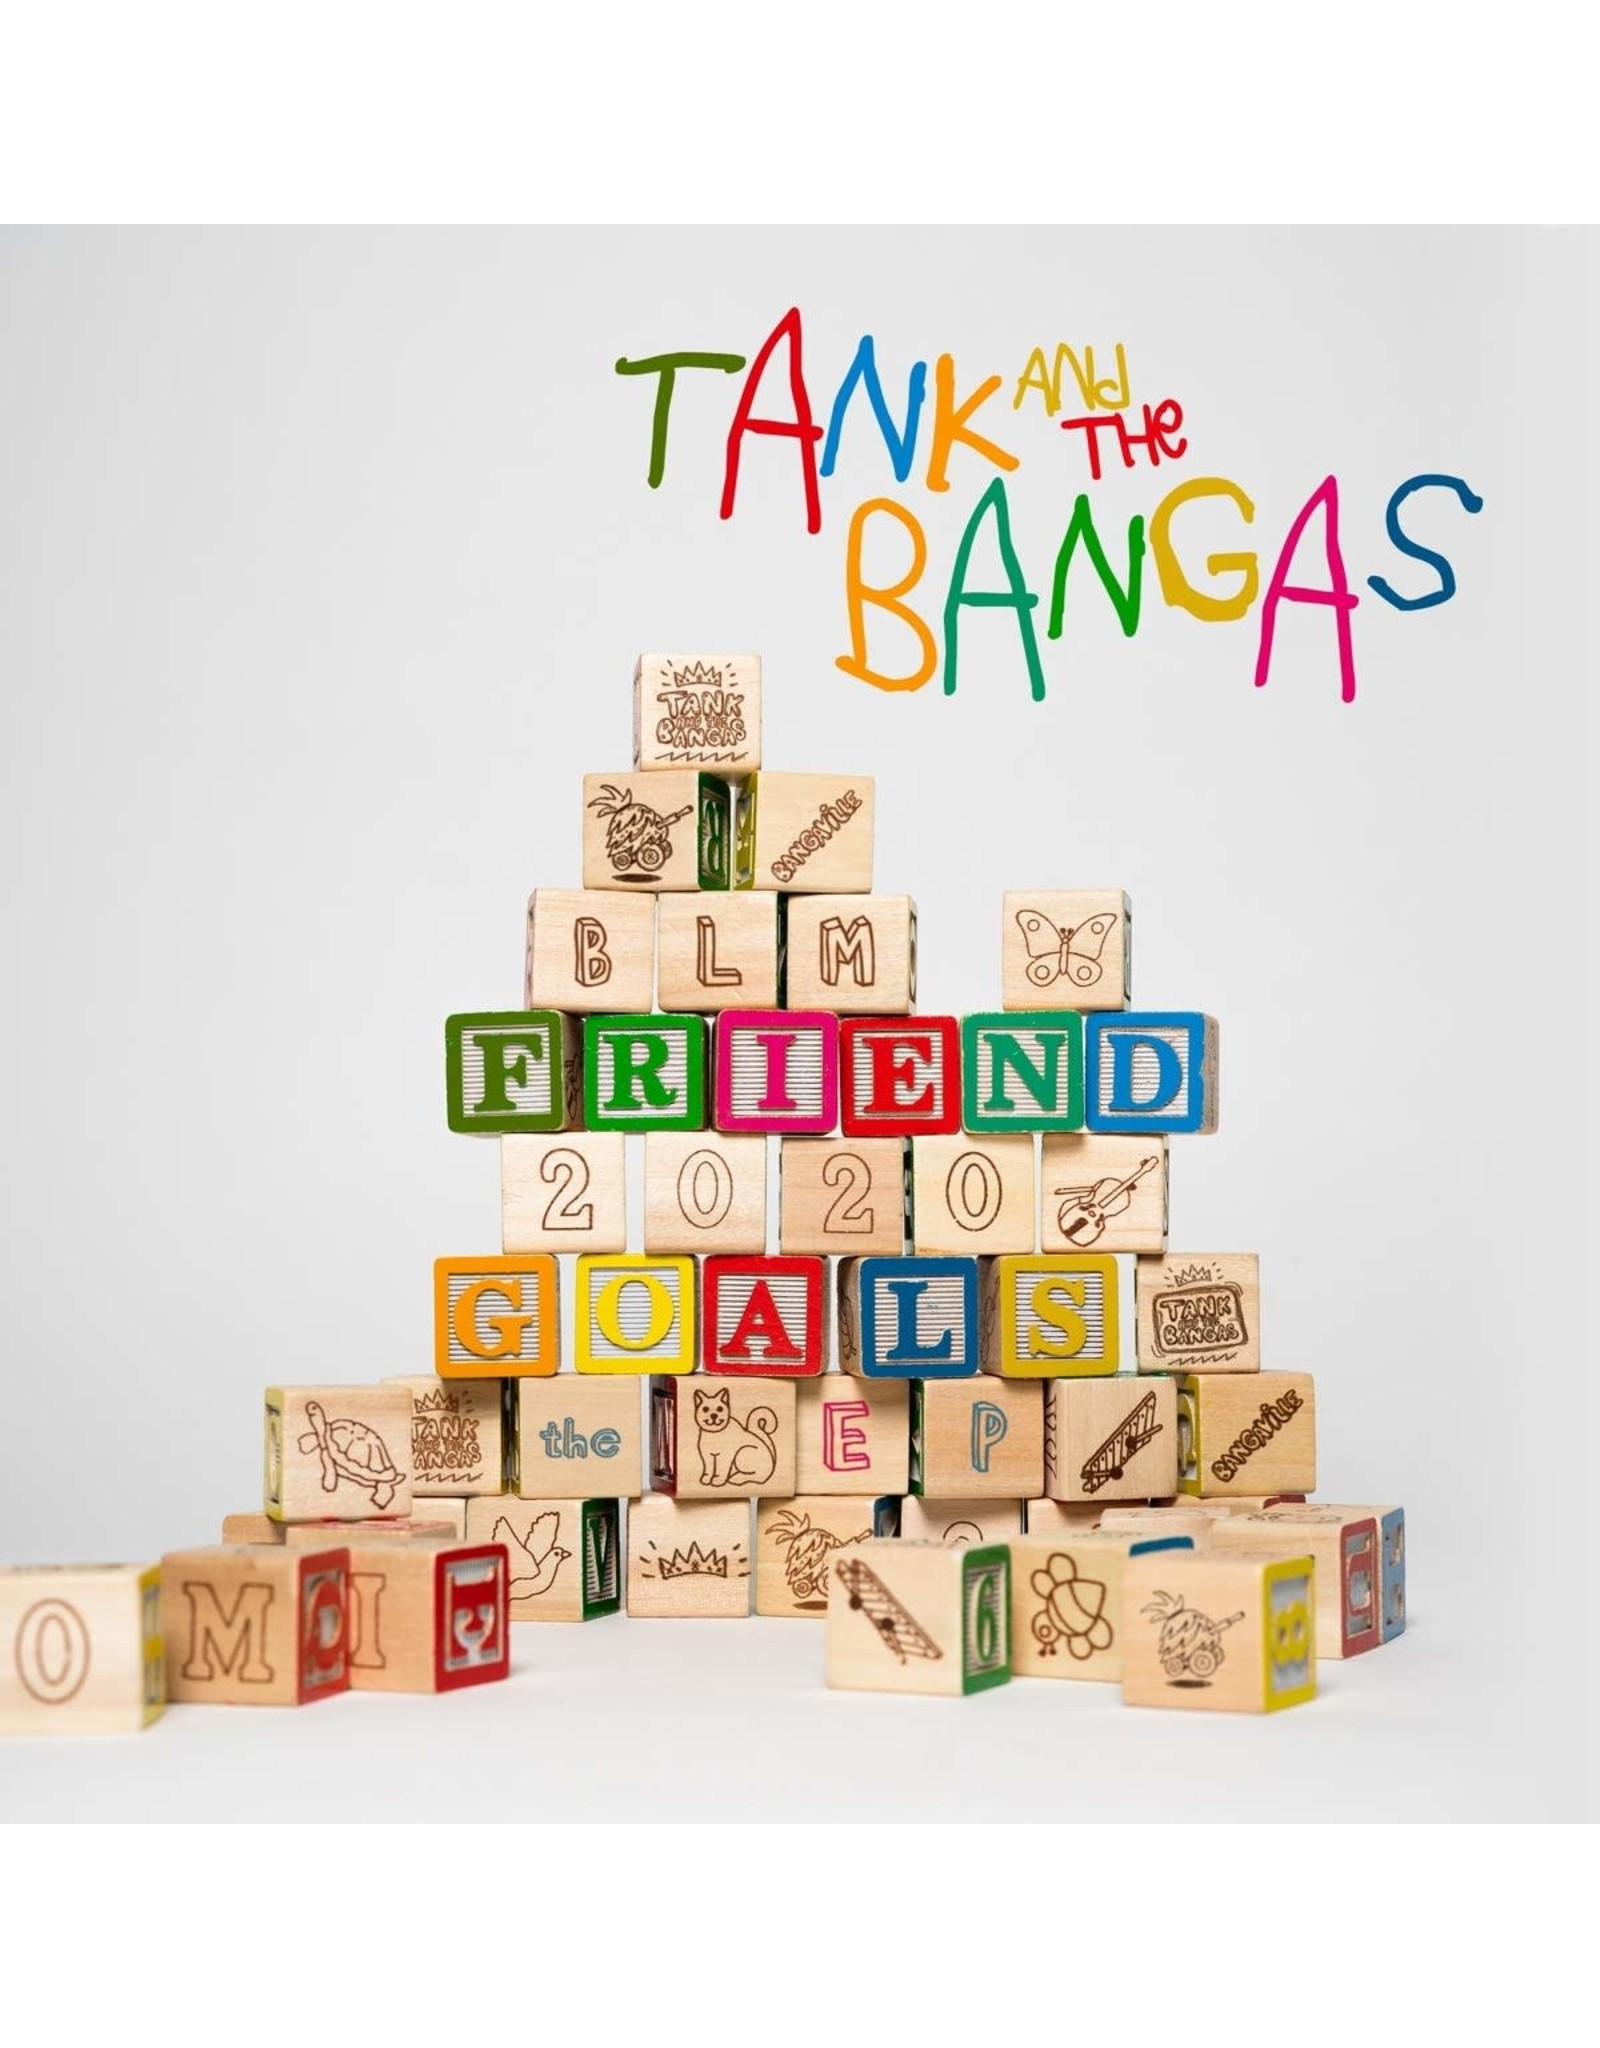 New Vinyl Tank And The Bangas - Friend Goals LP